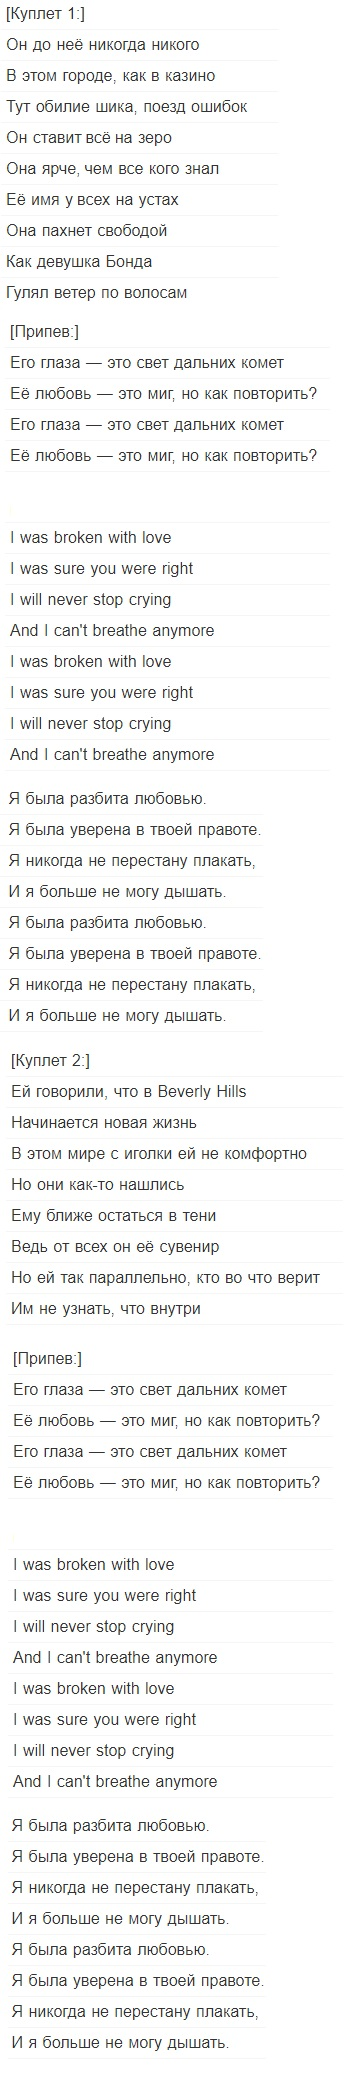 Слова песни